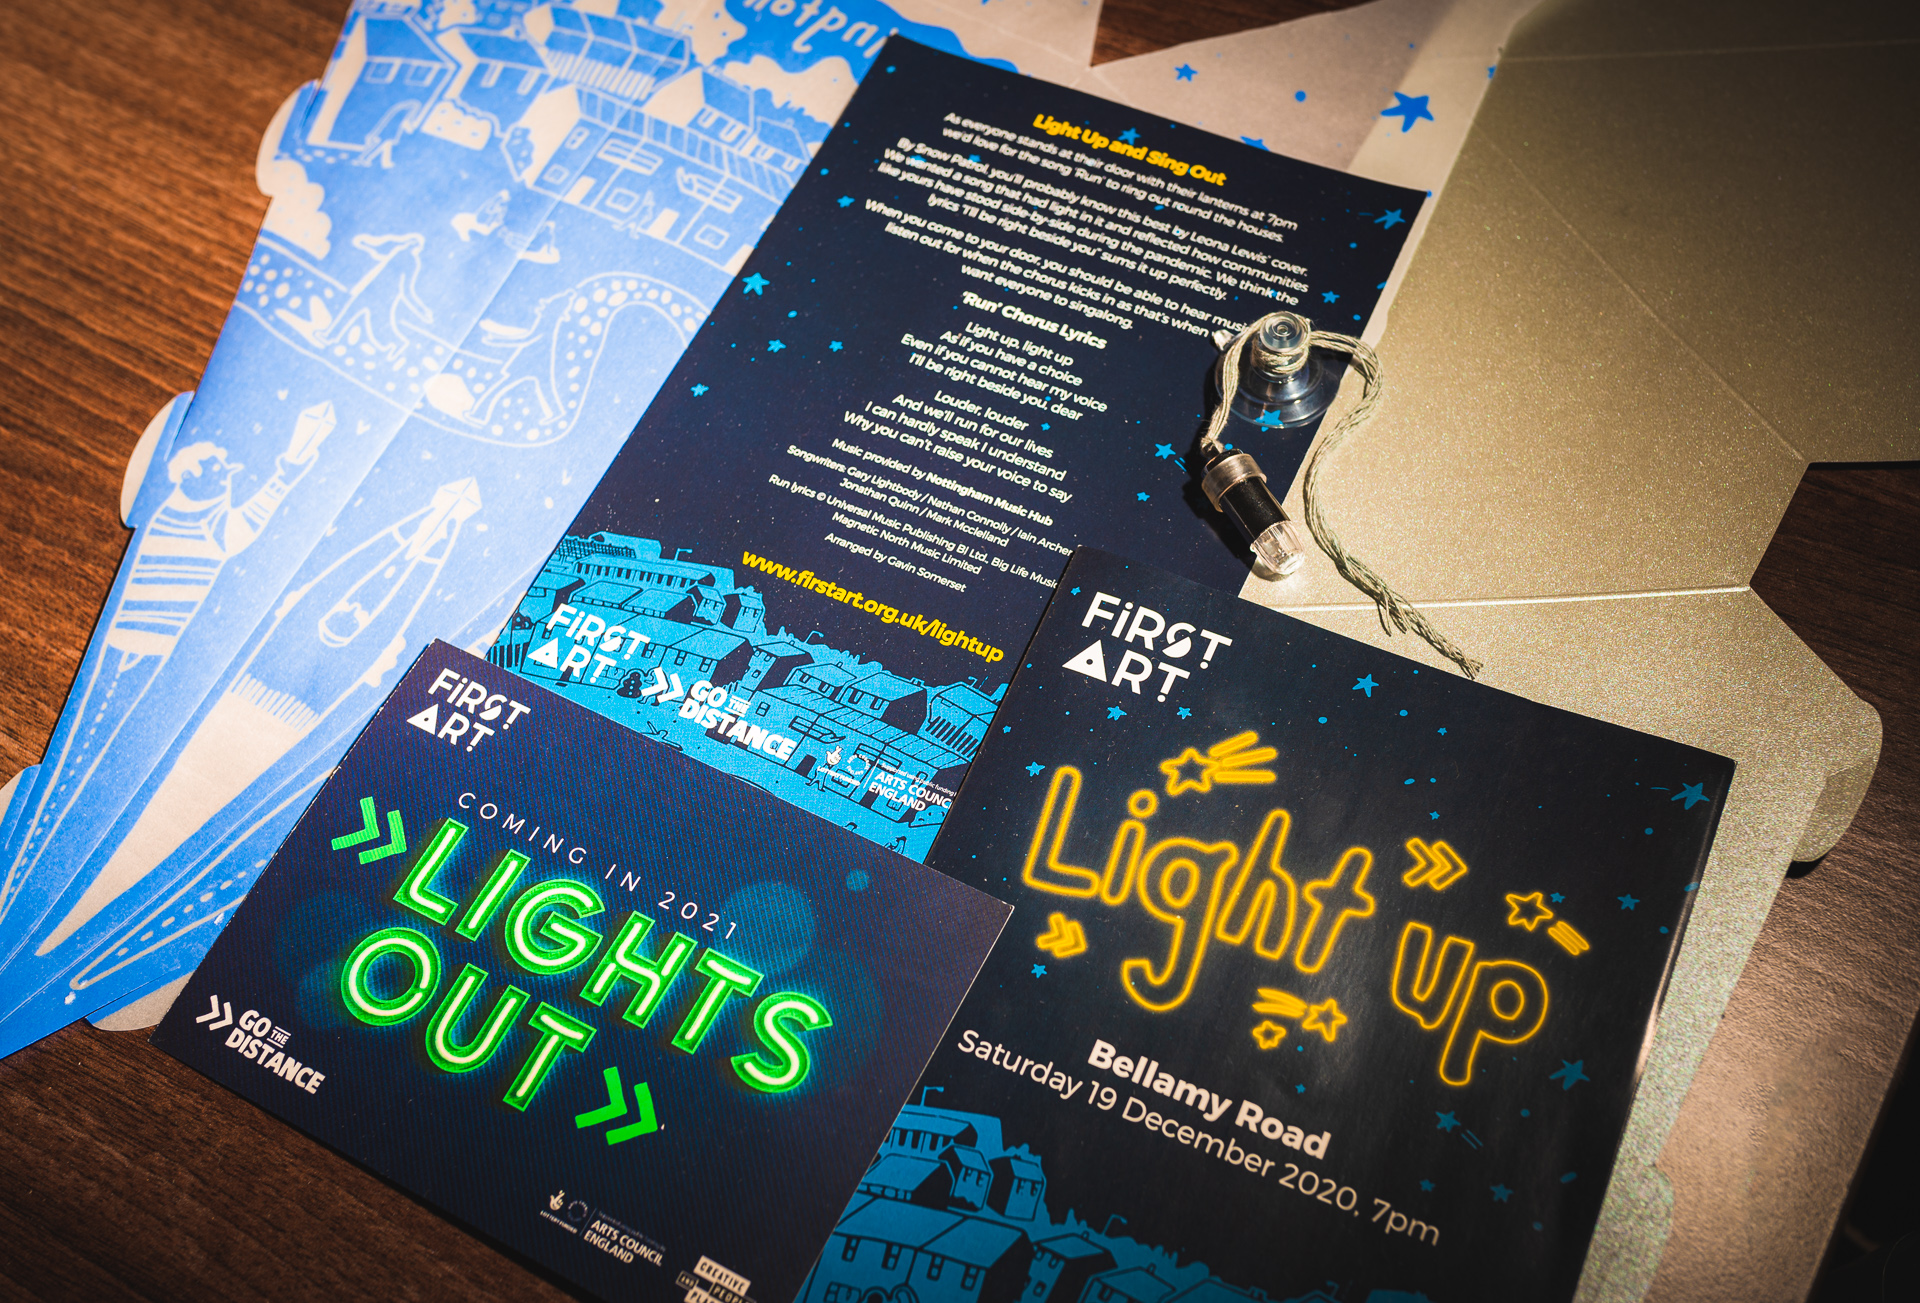 Lantern kit contents